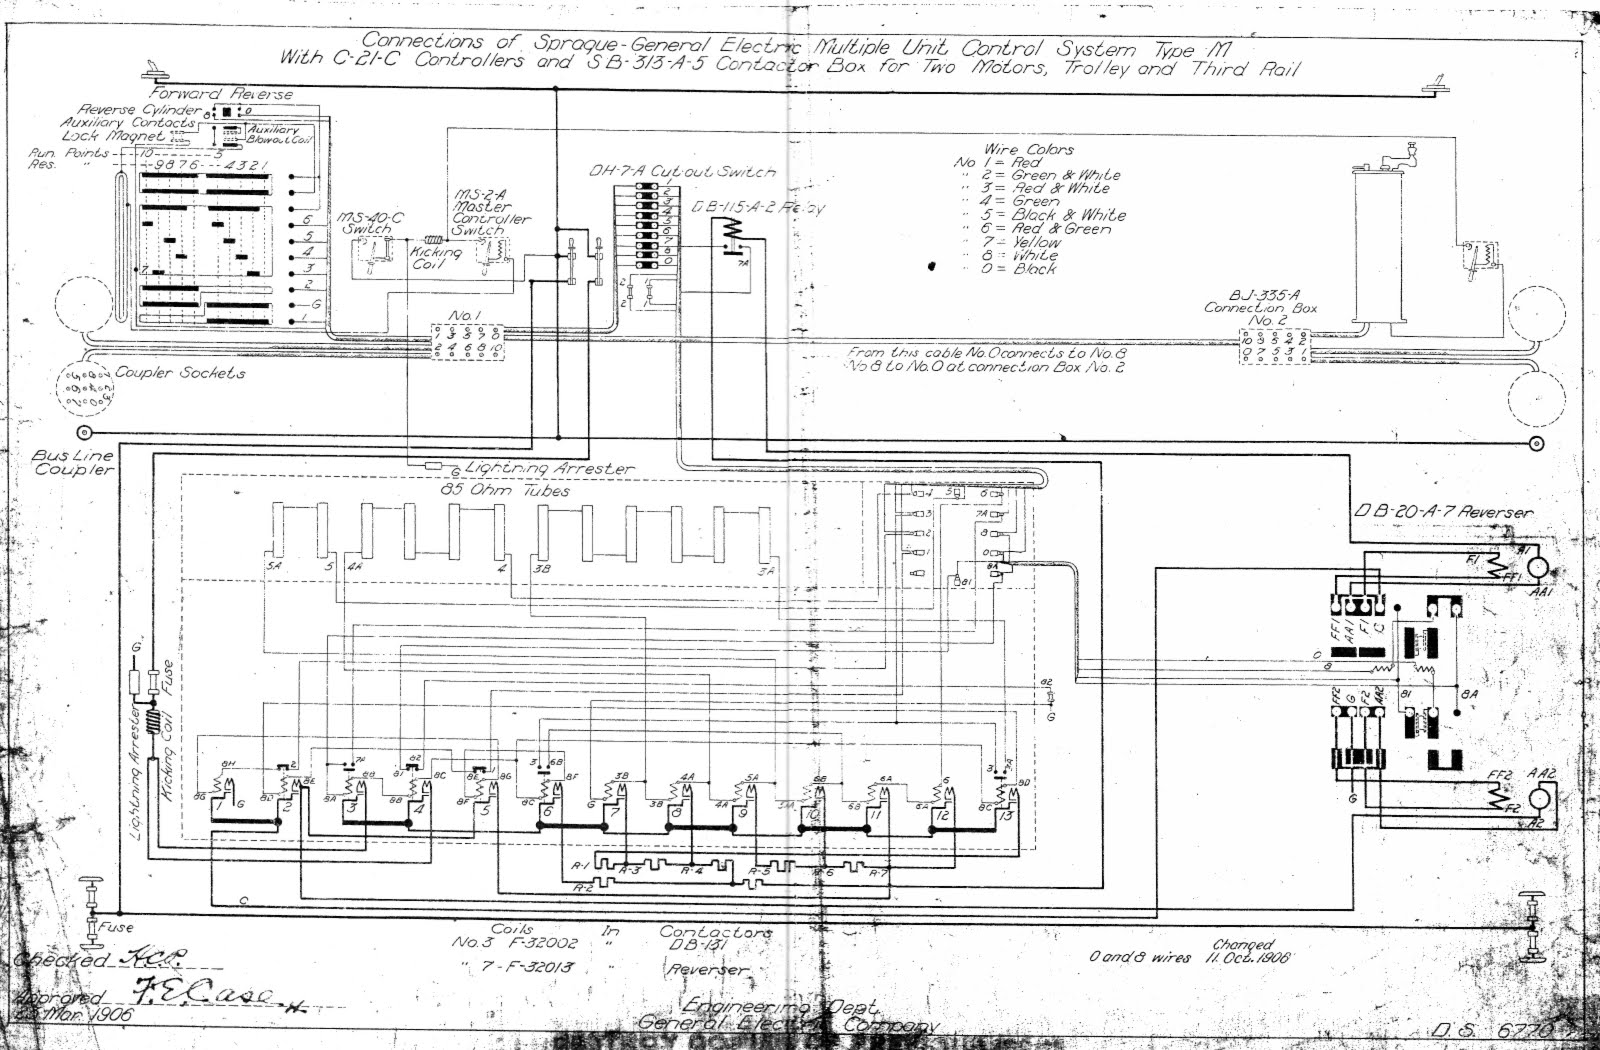 1999 Honda Accord Ignition Wiring Diagram